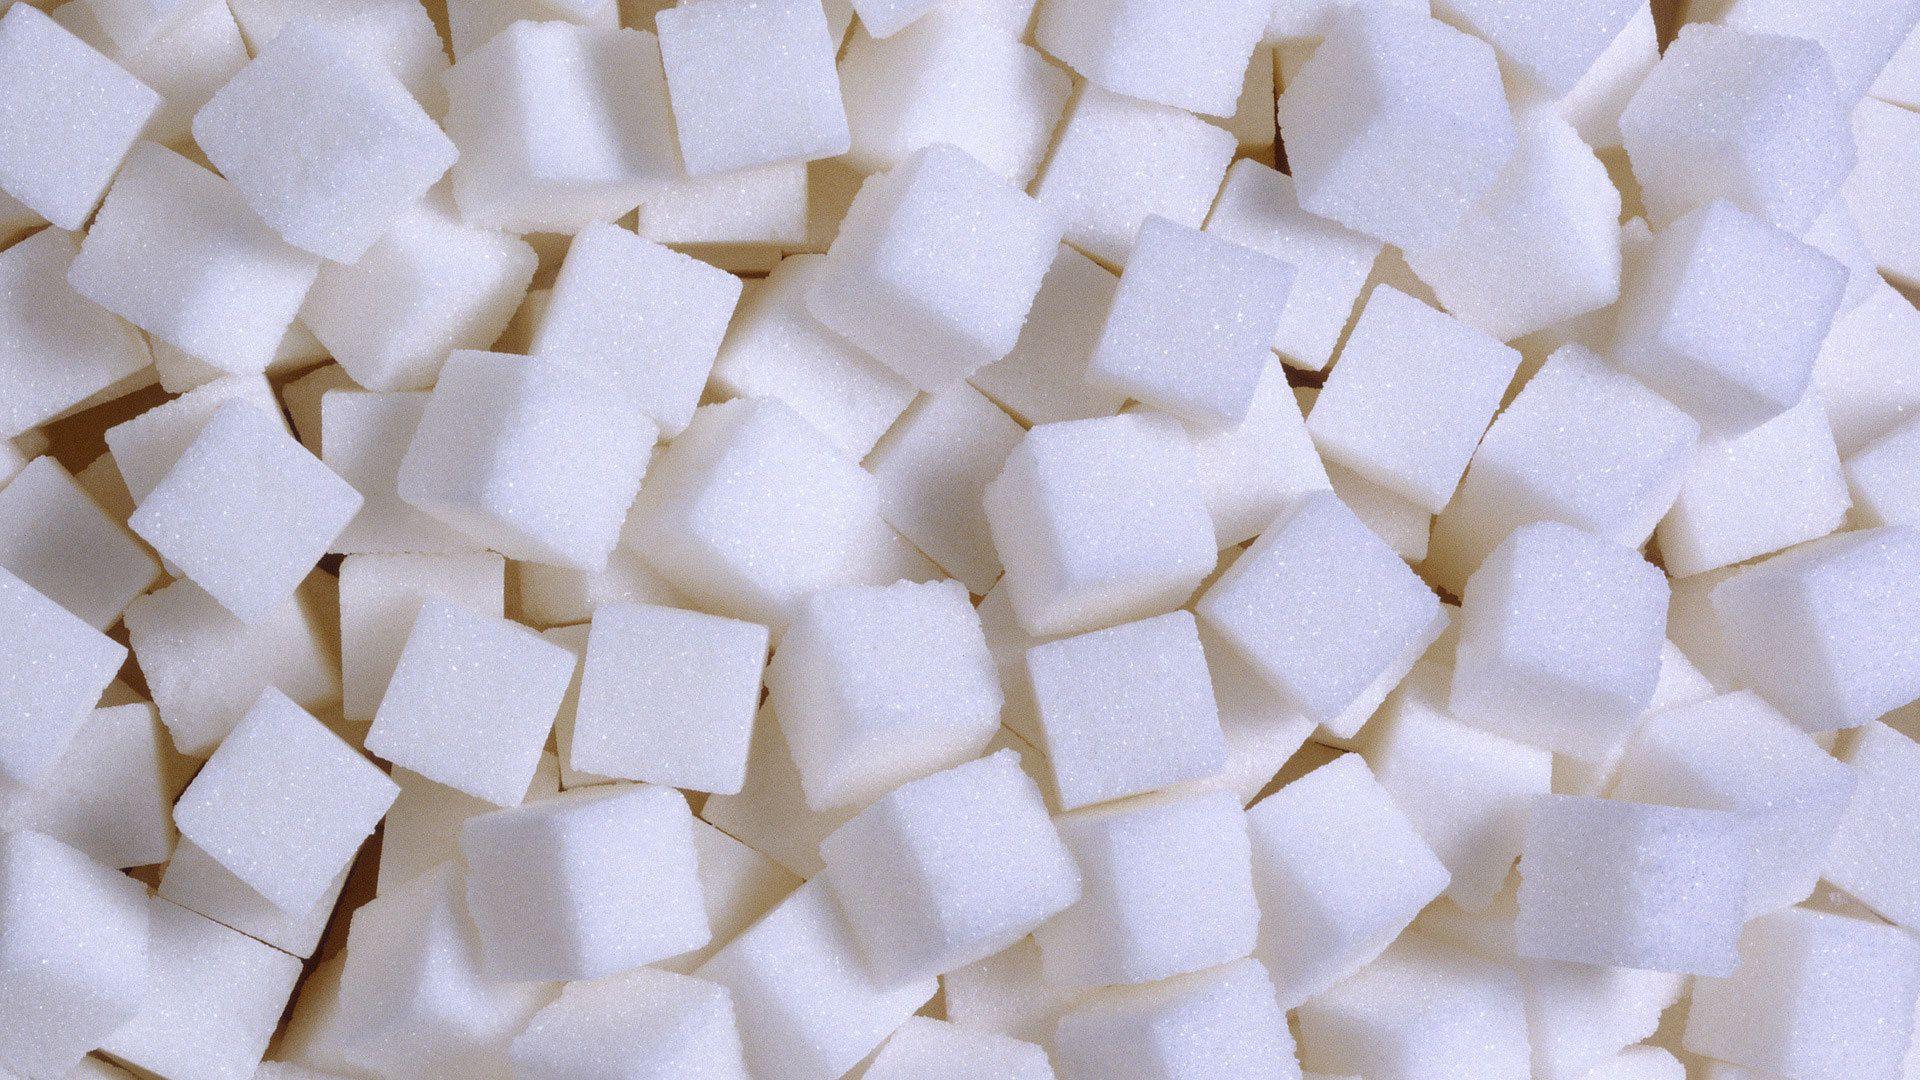 Sugar download free wallpaper image search